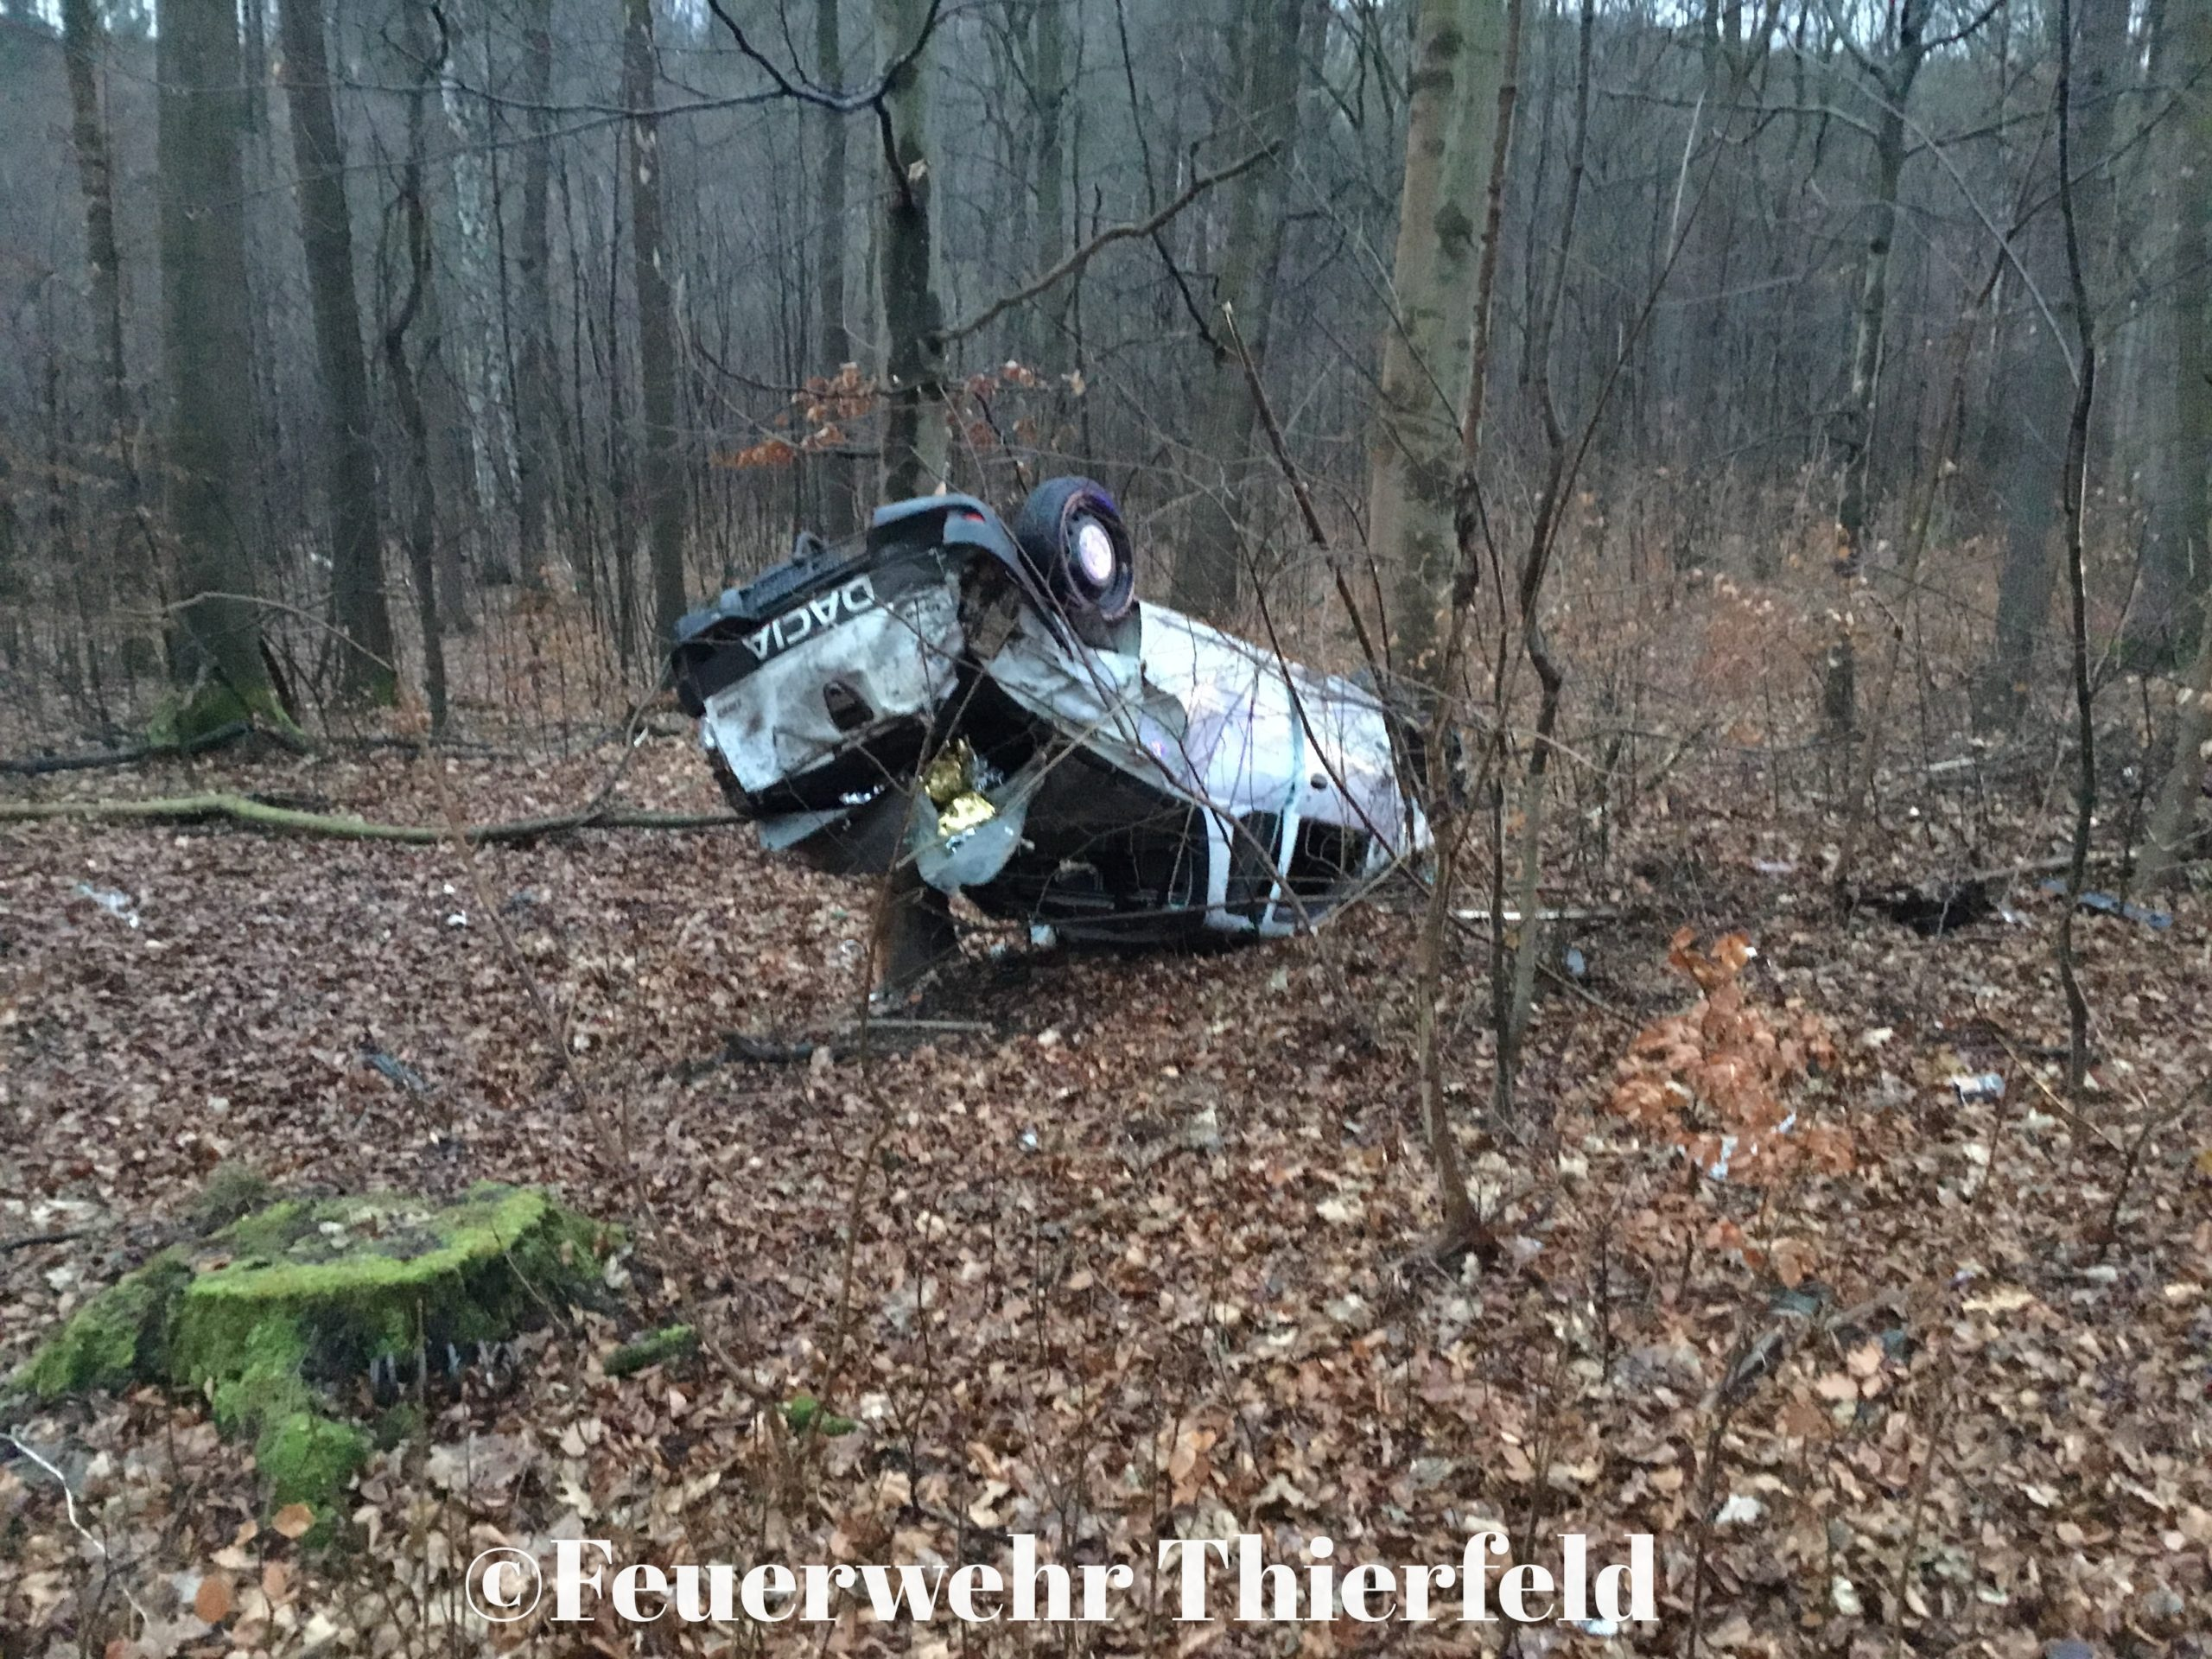 Einsatz 2: THL1 – auslaufende Betriebsmittel nach Verkehrsunfall